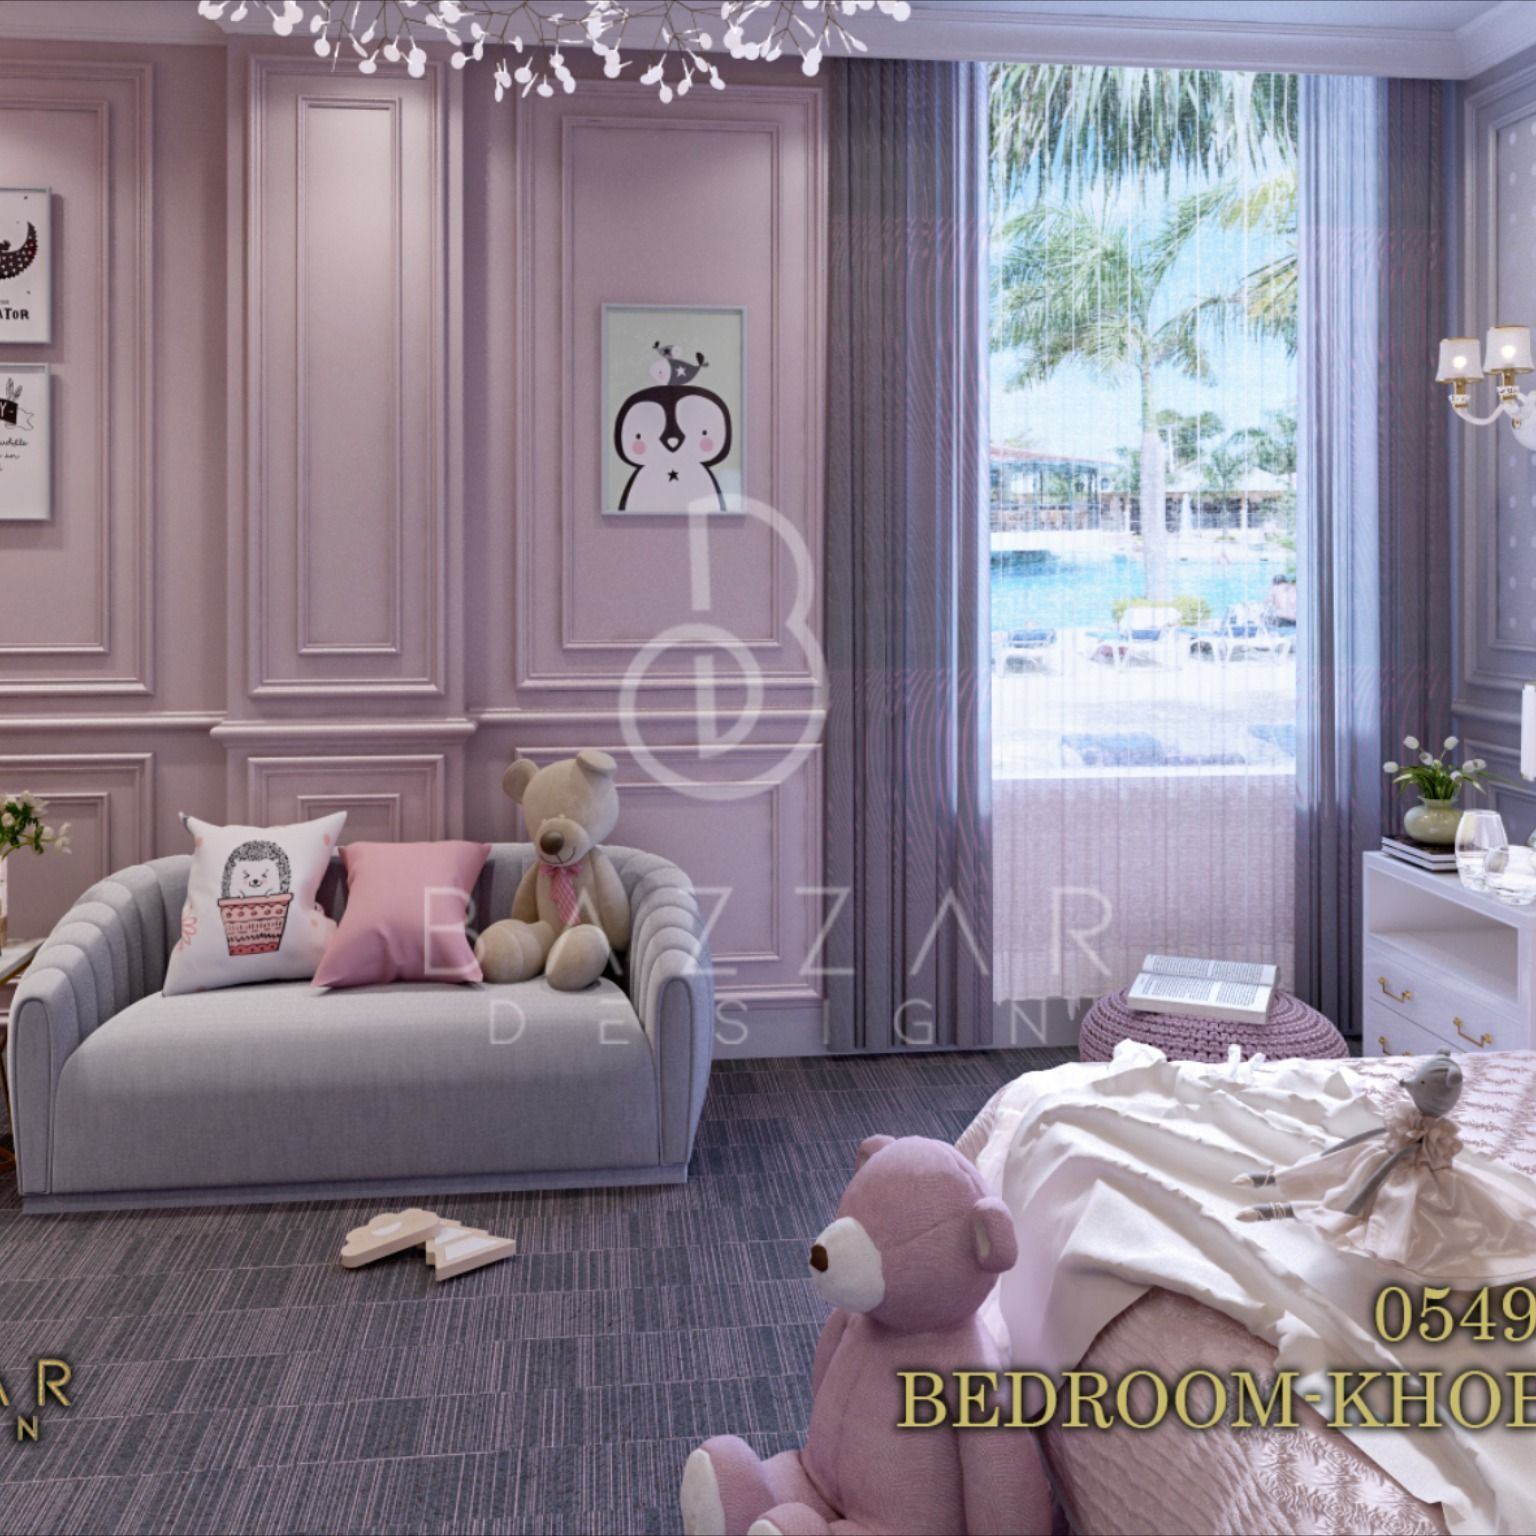 غرفه نوم بنت نيوكلاسيك بألوان وتصميم يتناسب مع عمر الطفله غرف نوم ديكور مودرن غرف نوم مودرن خليك بالبيت تصميم داخل Home Decor Chaise Lounge Decor